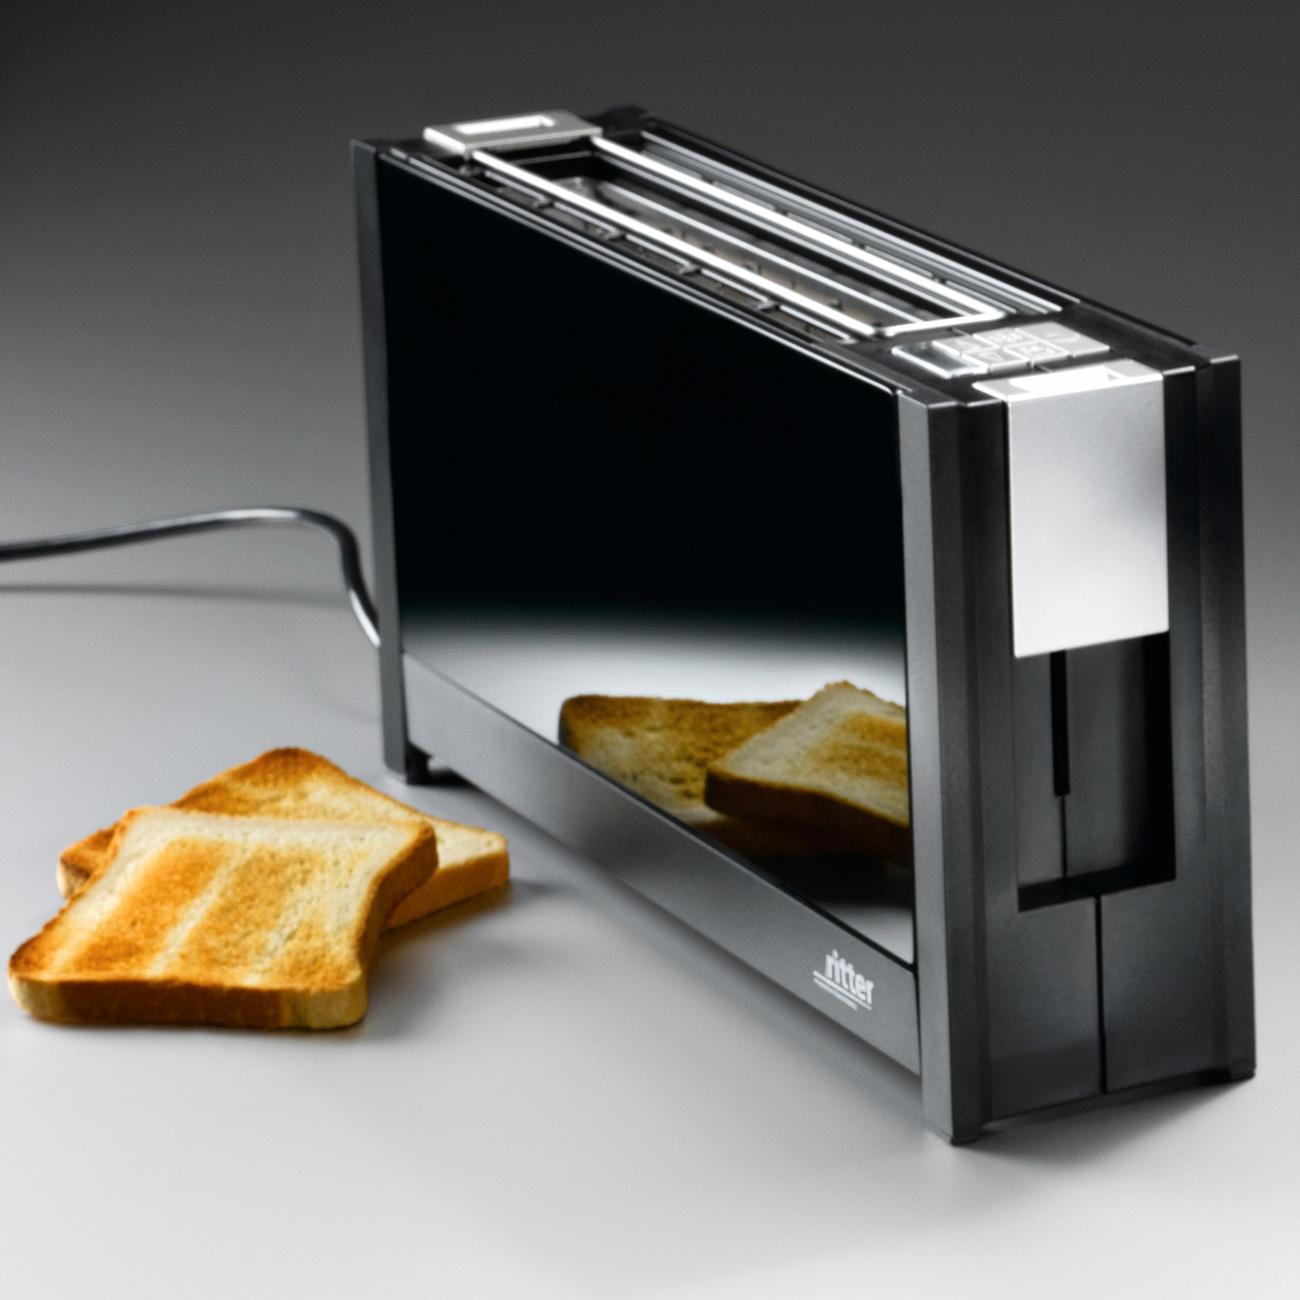 Toaster volcano 5